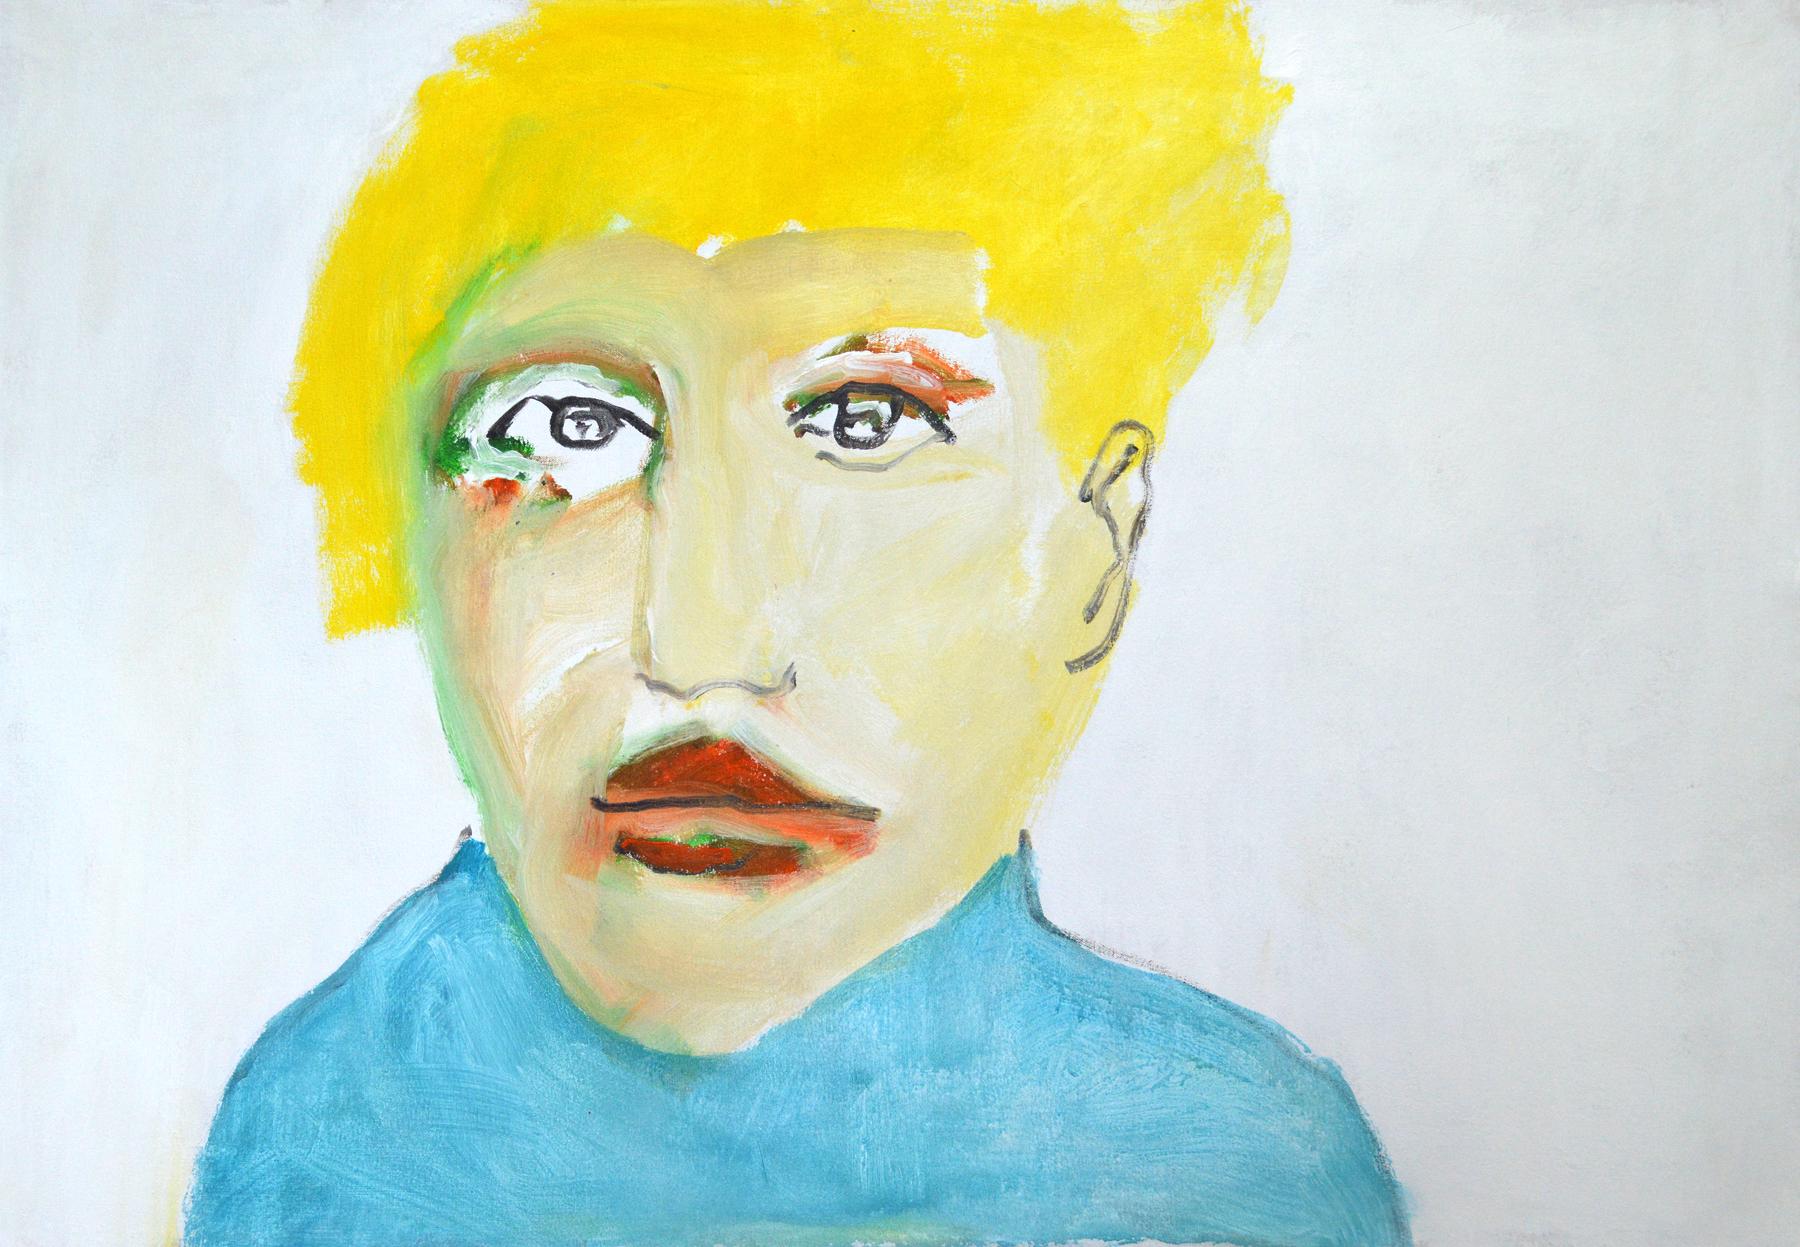 Blonder , 2009 Acrylic on canvas 33 x 48.5 in. (84 x 123 cm.) Photography courtesy of Joshua DeMello